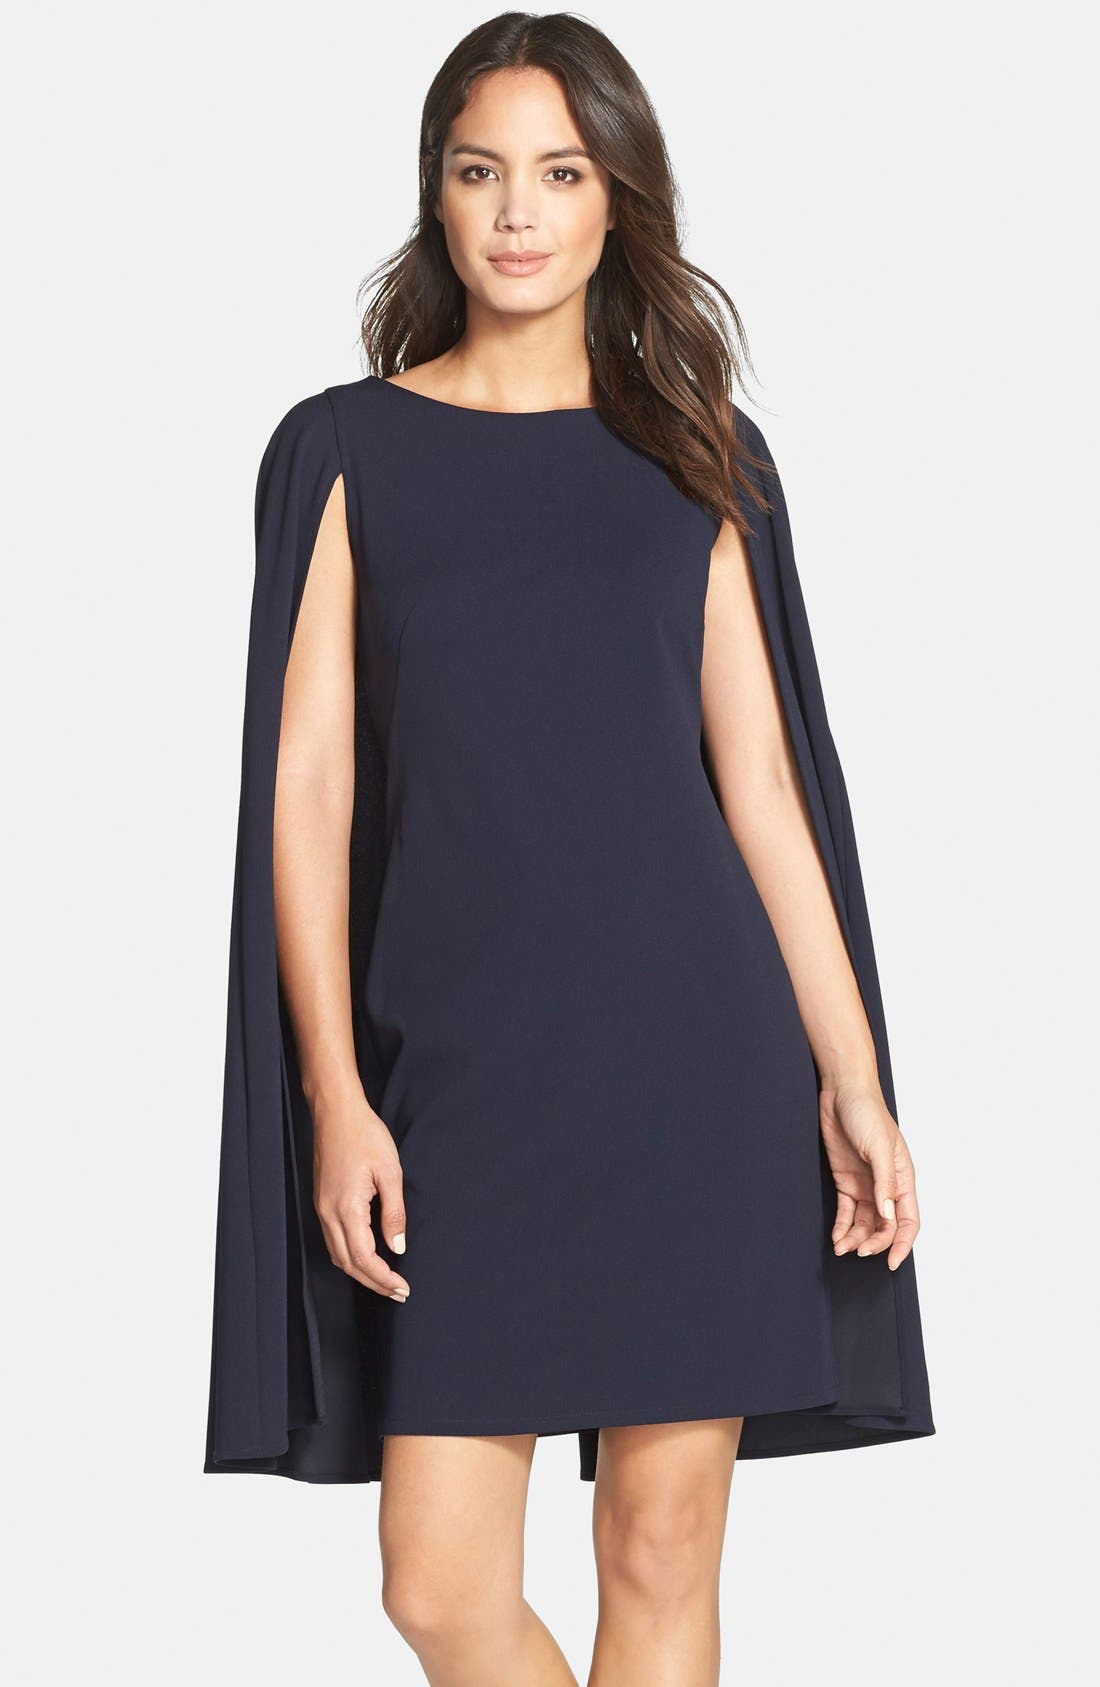 ADRIANNA PAPELL,                             Cape Sheath Dress,                             Main thumbnail 1, color,                             412